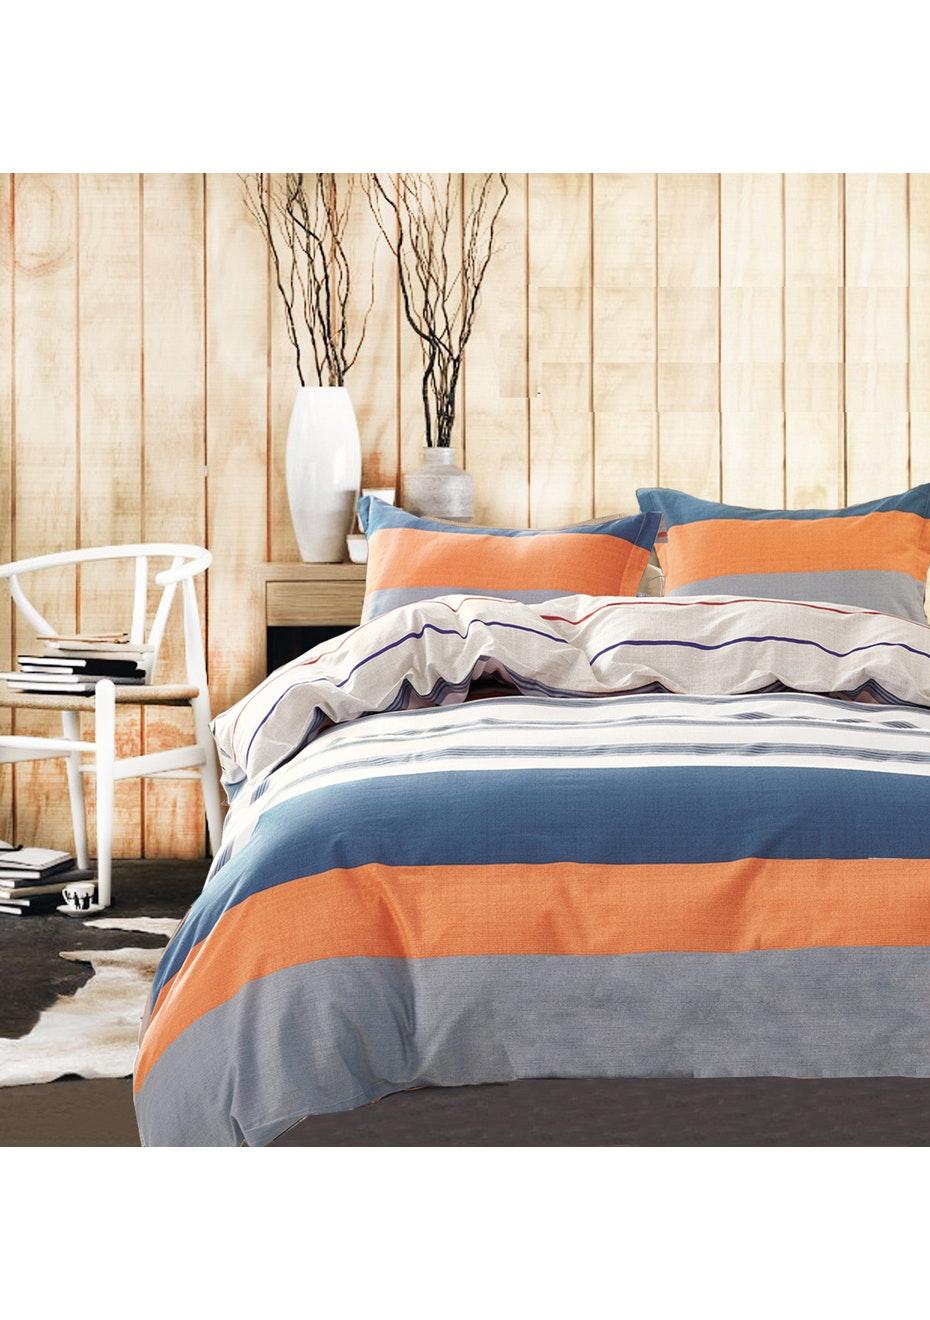 Nelson Bay Quilt Cover Set - Reversible Design - 100% Cotton - Single Bed